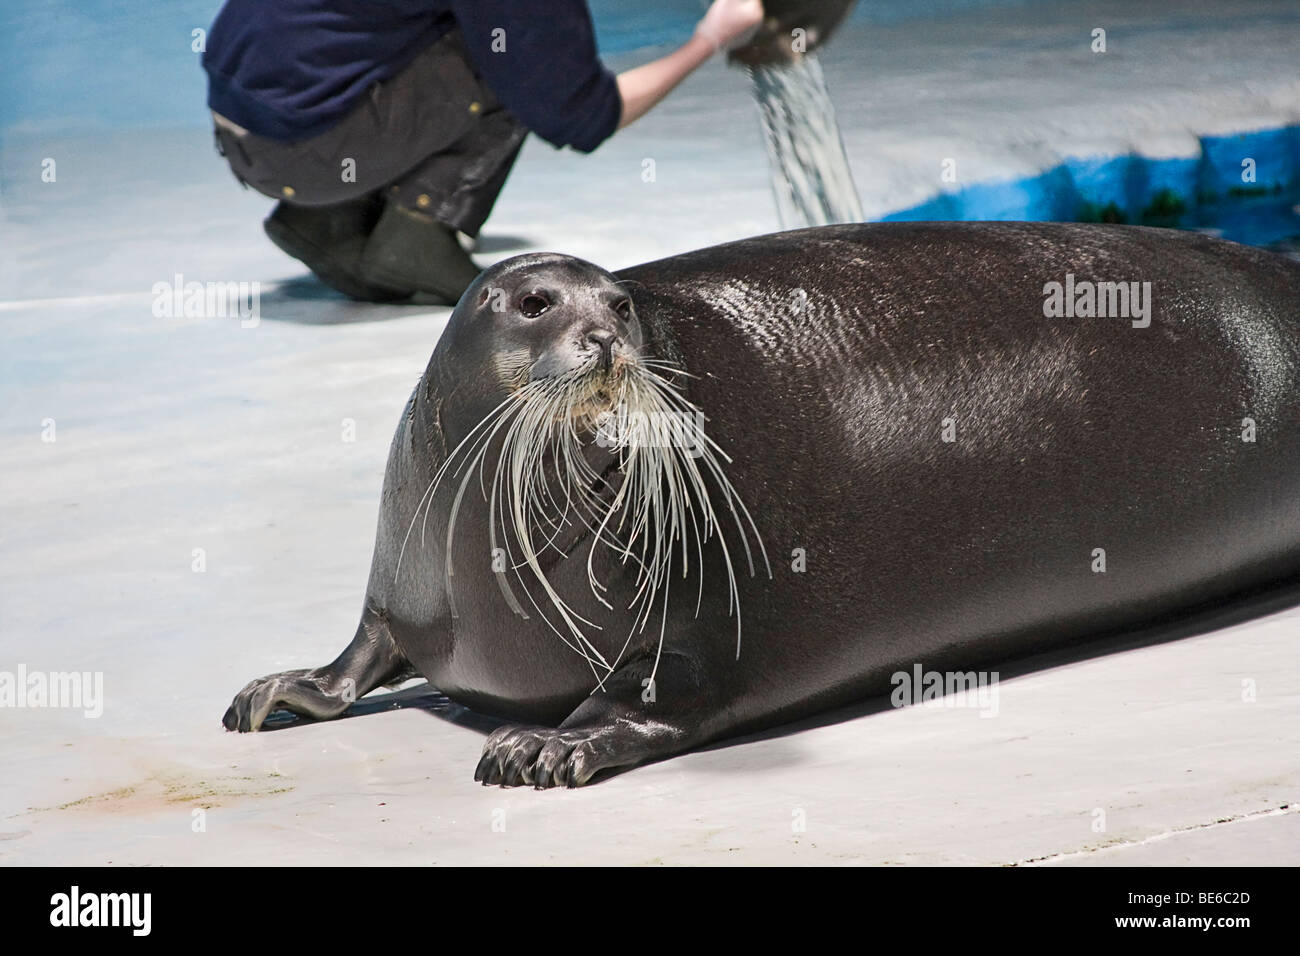 Bearded seal in The Polaria museum and aquarium in Tromso, Norway Stock Photo